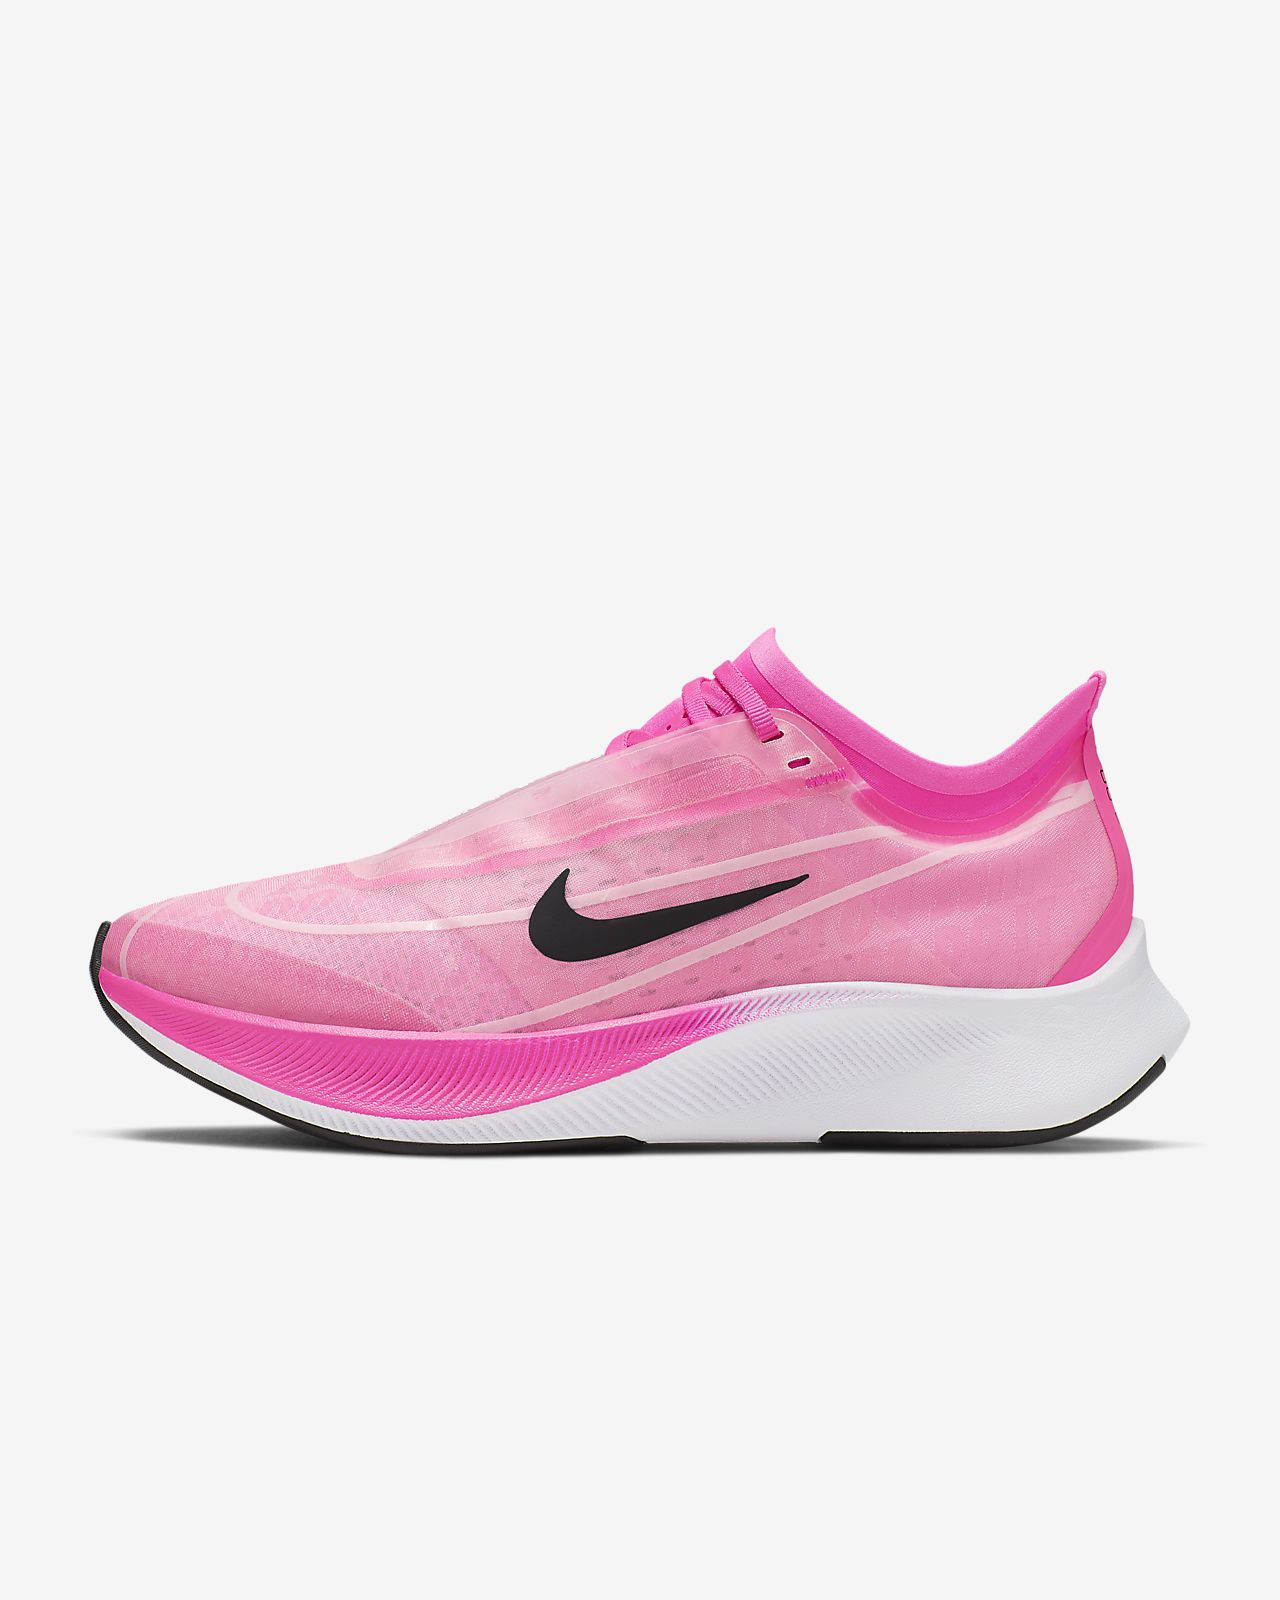 Hurtig Levering Auf Nike Sport Løb Udsalg Køb Idag  Nike